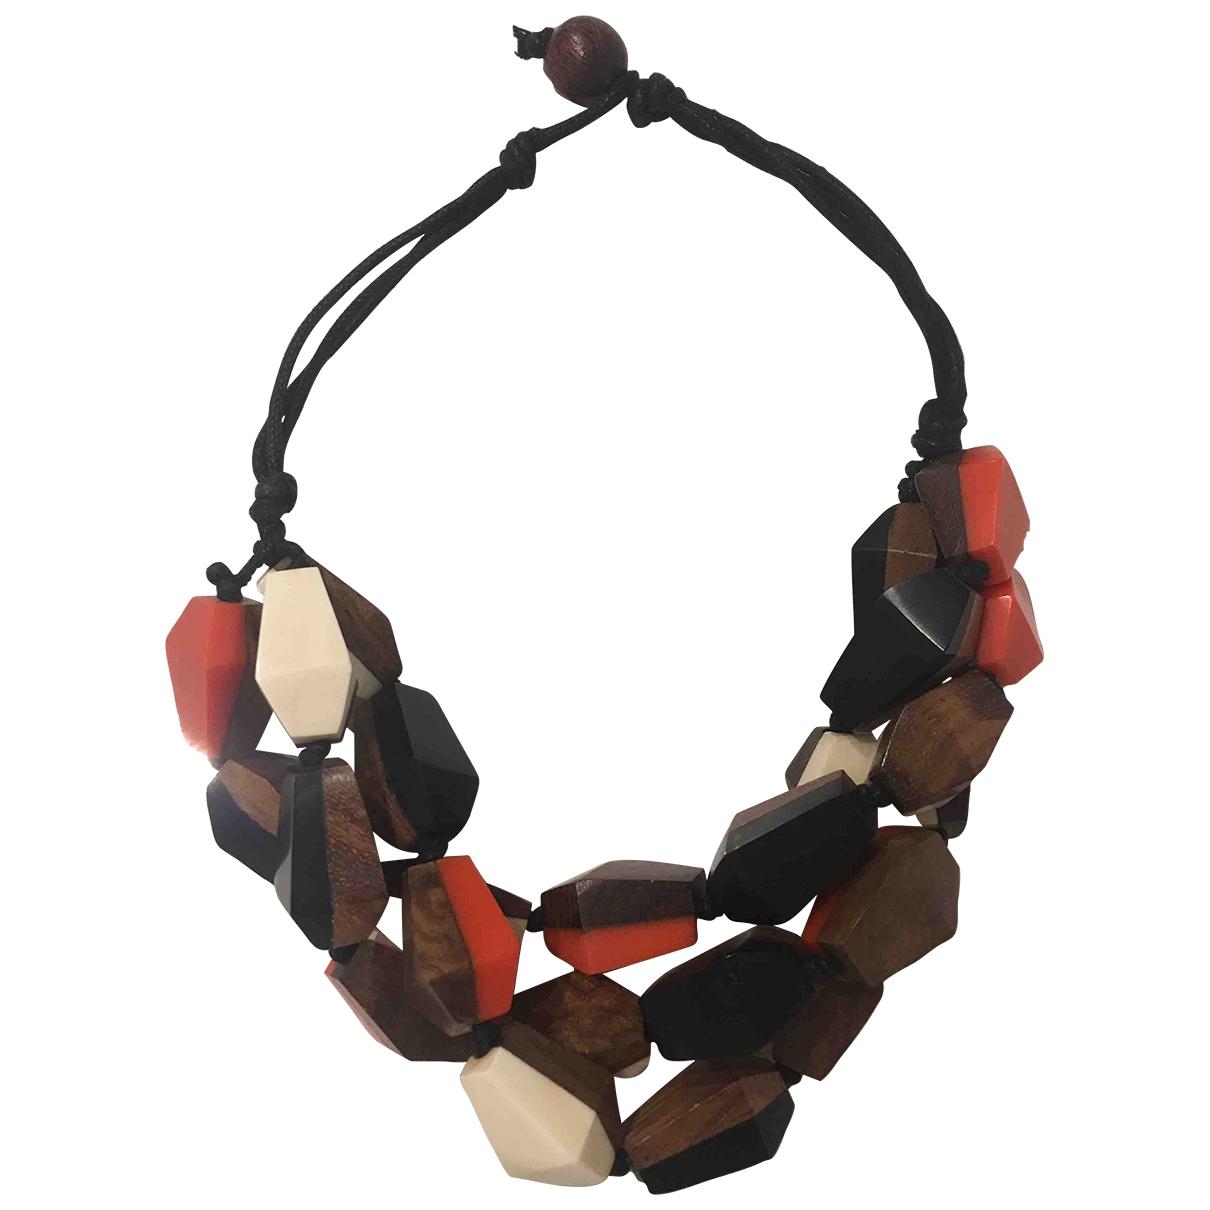 Collar Motifs Ethniques Non Signe / Unsigned